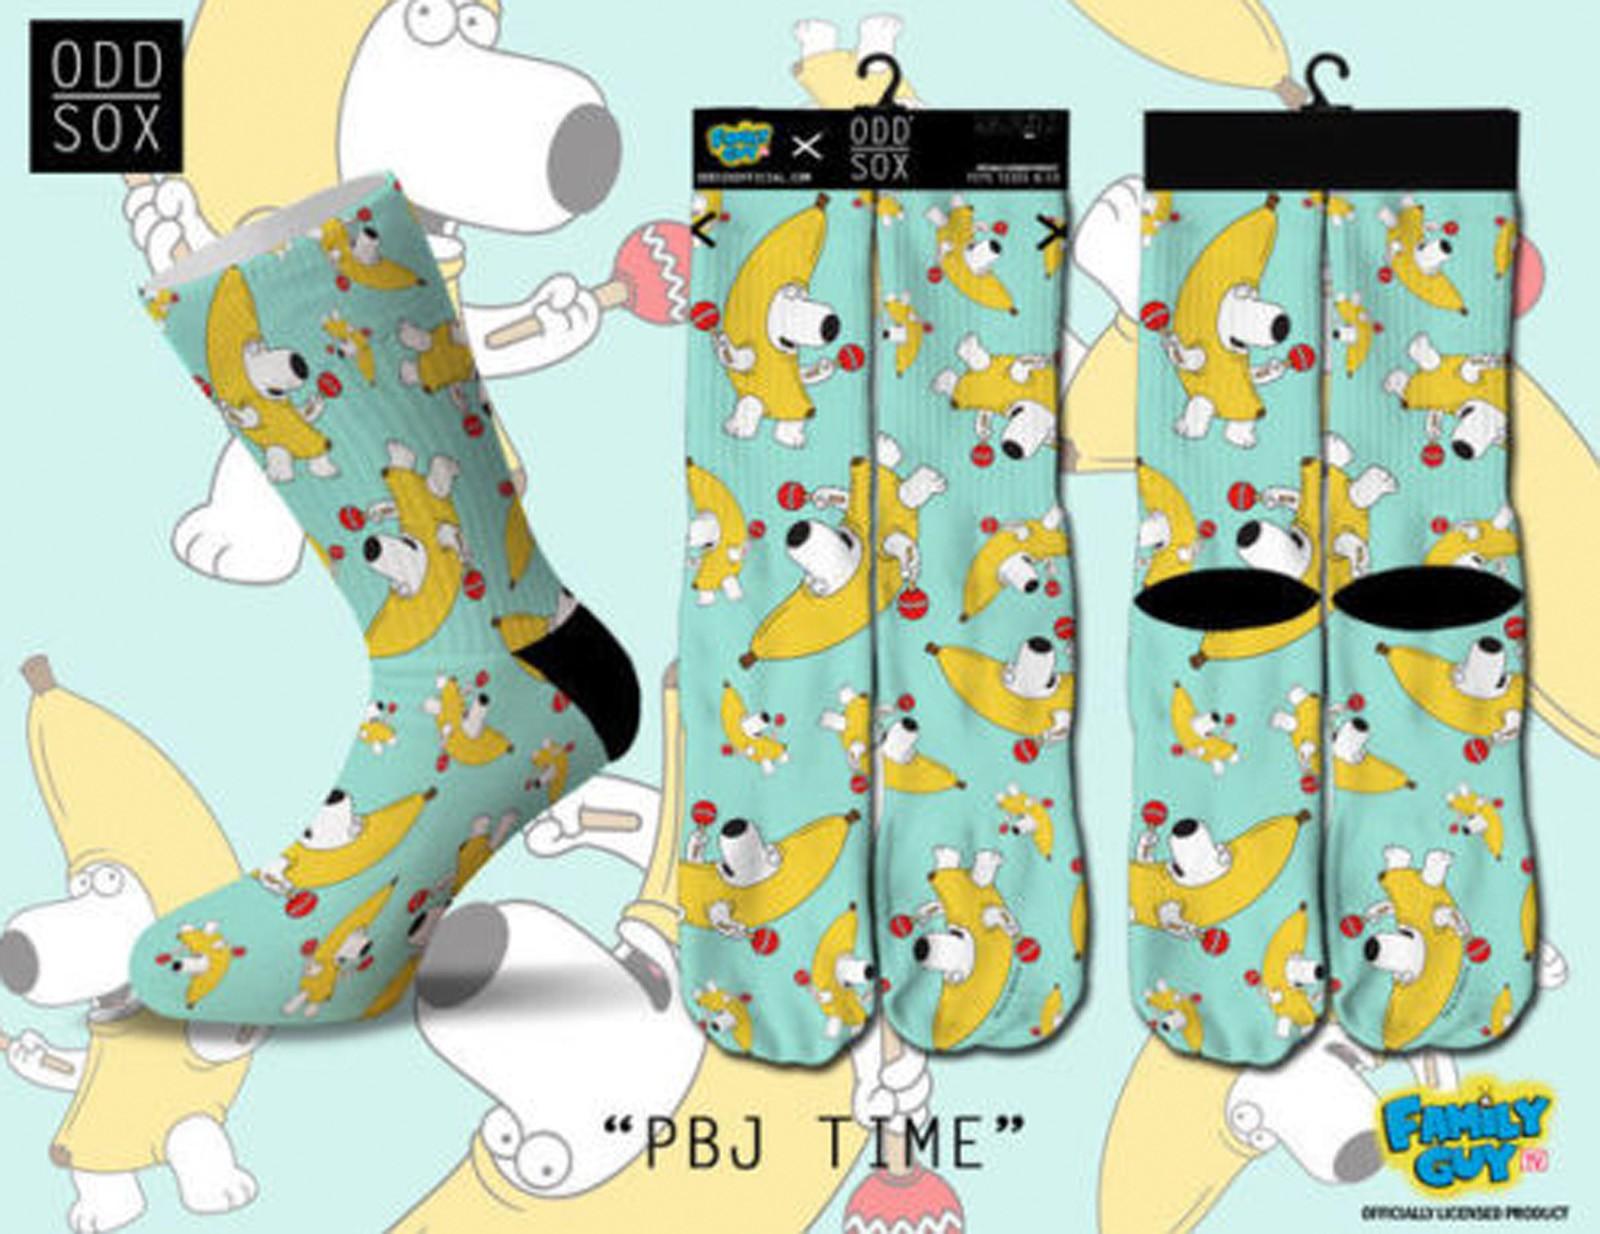 ODD Sox - Family Guy Edition PBJ Time Socken